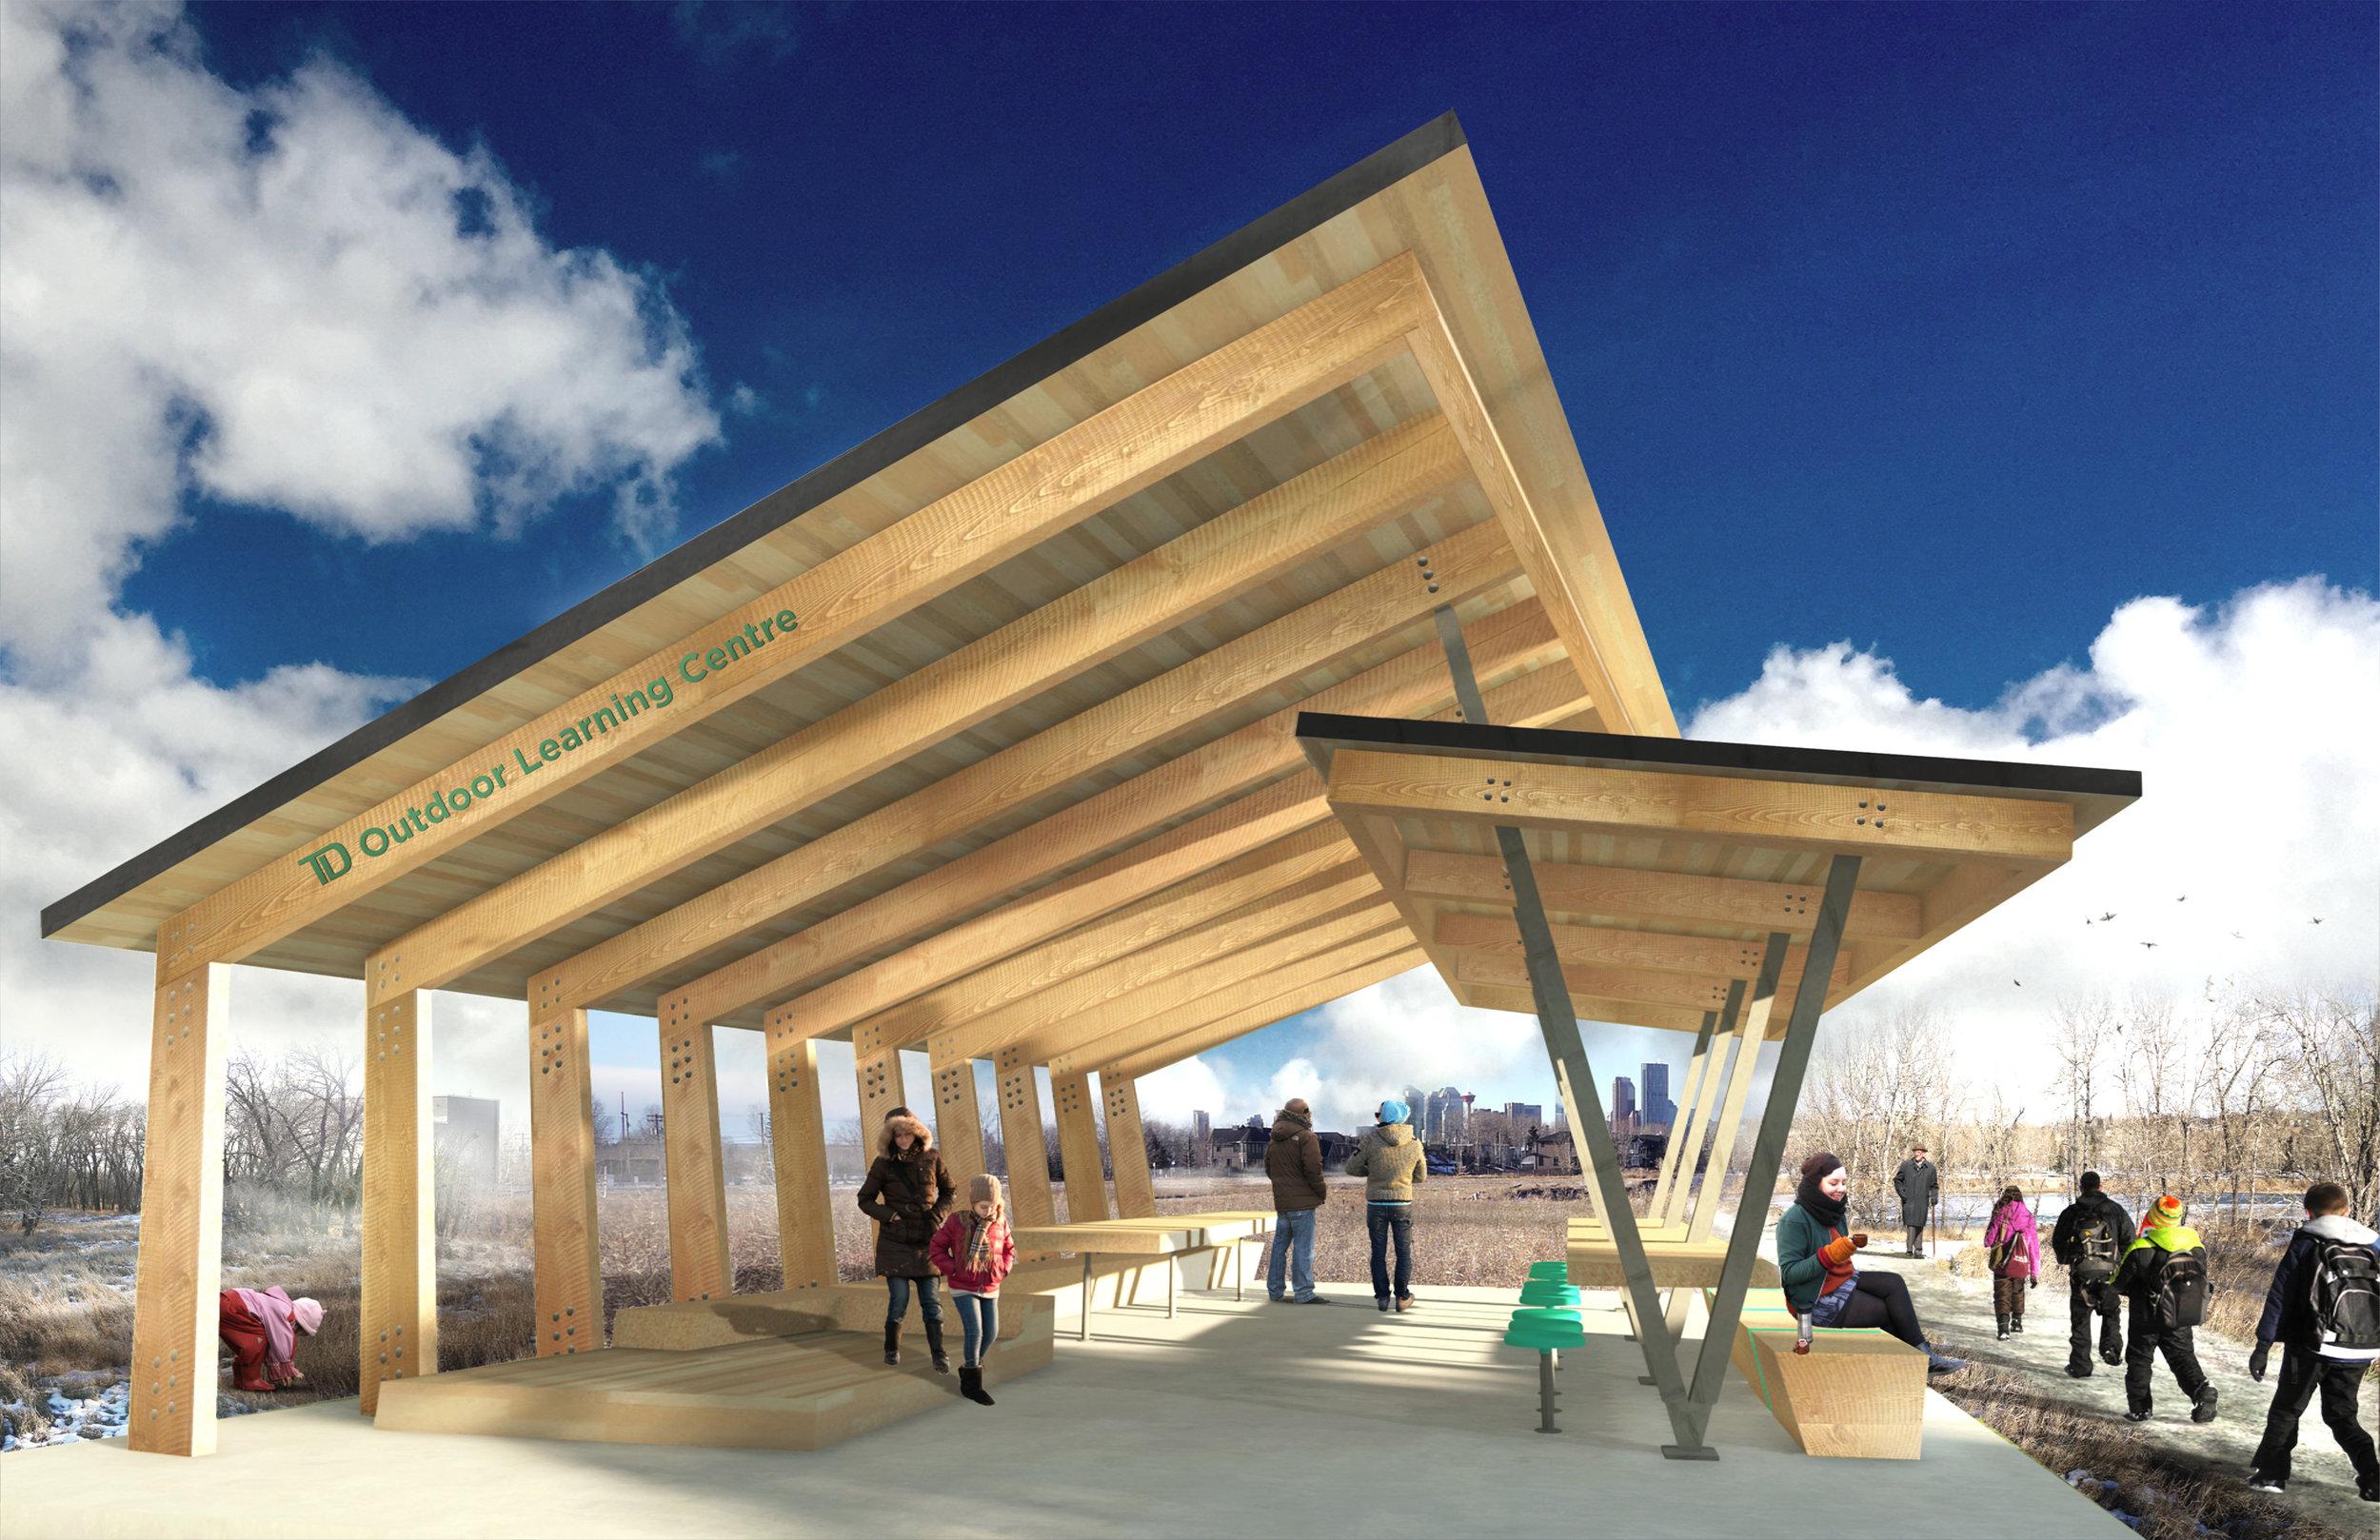 TD Outdoor Learning Centre_Facing City2.jpg